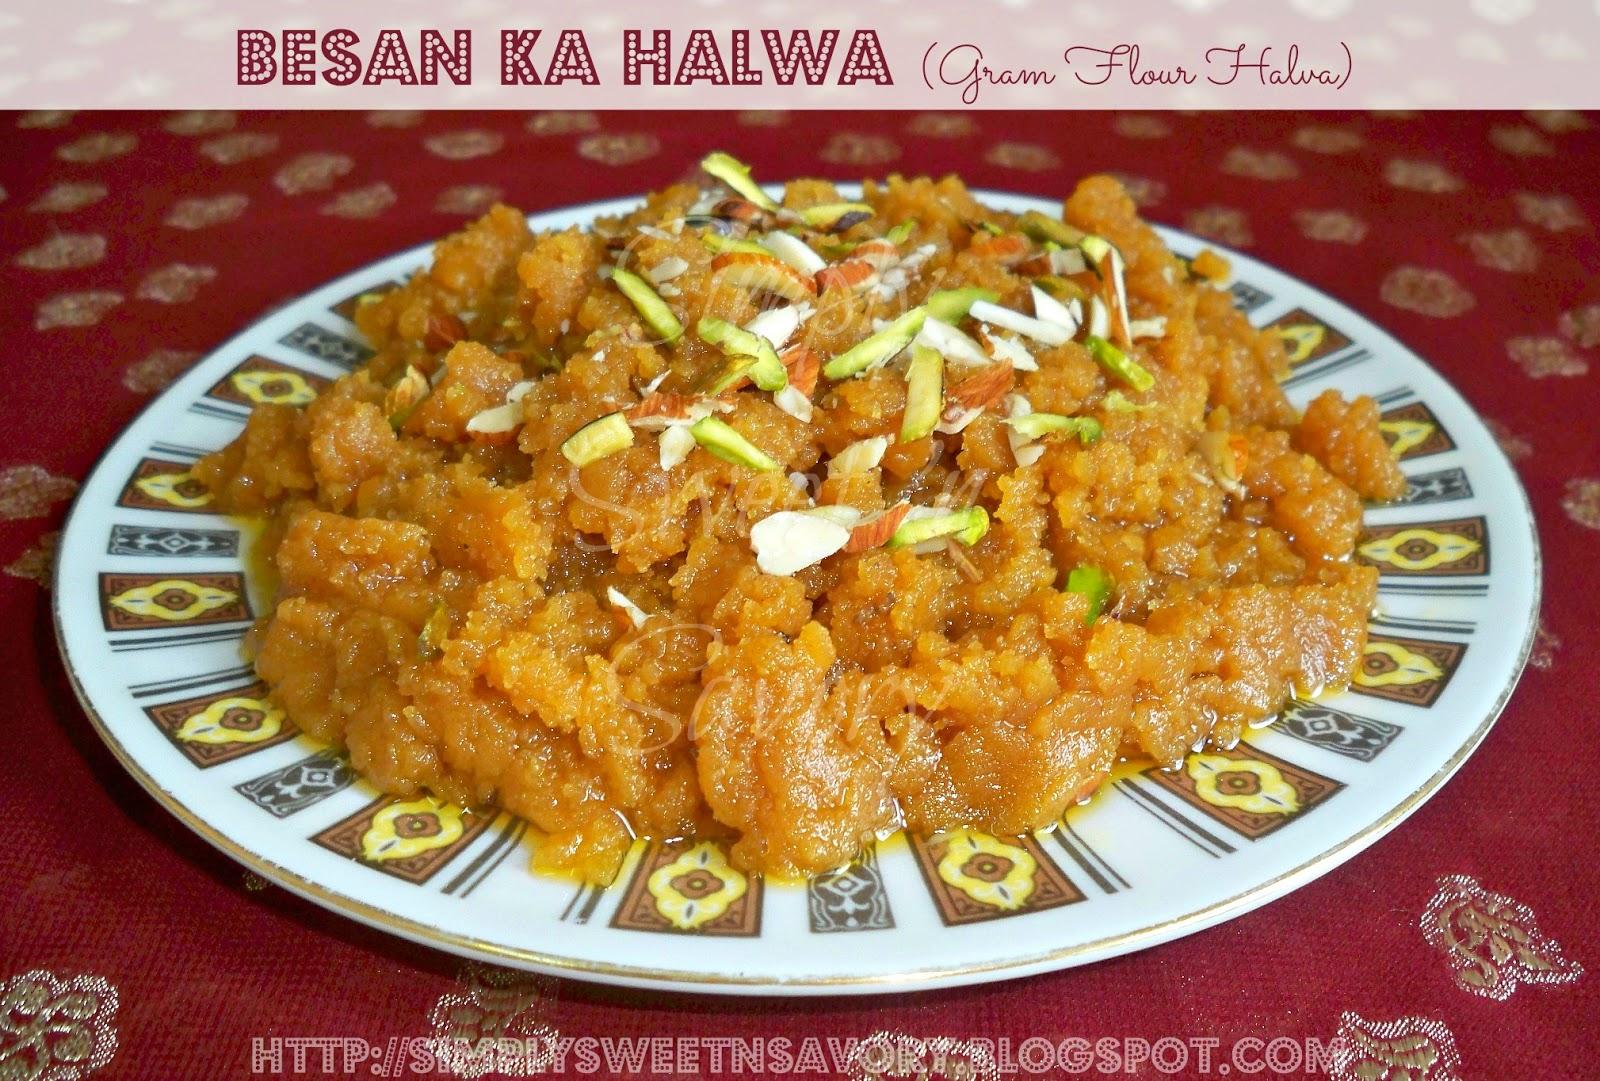 Besan Ka Halwa ( Gram Flour Halva )